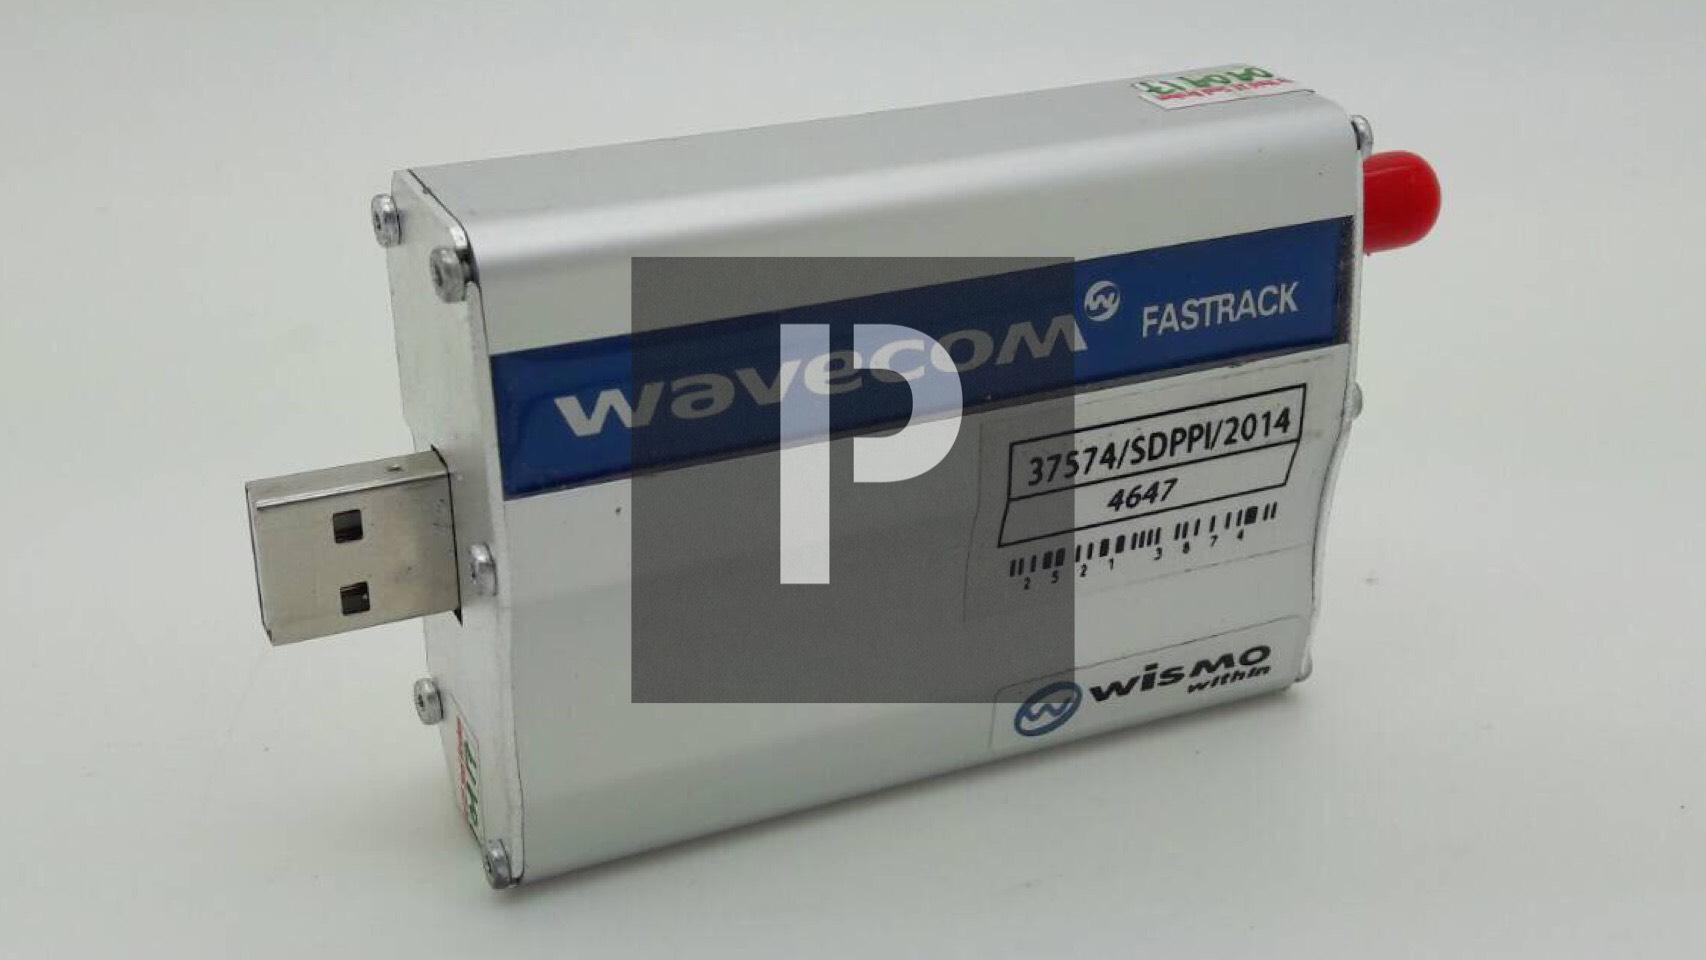 Jual Modem Wavecom Single M1306b Q2406b Usb Perangkatkerasku Satu Tokopedia